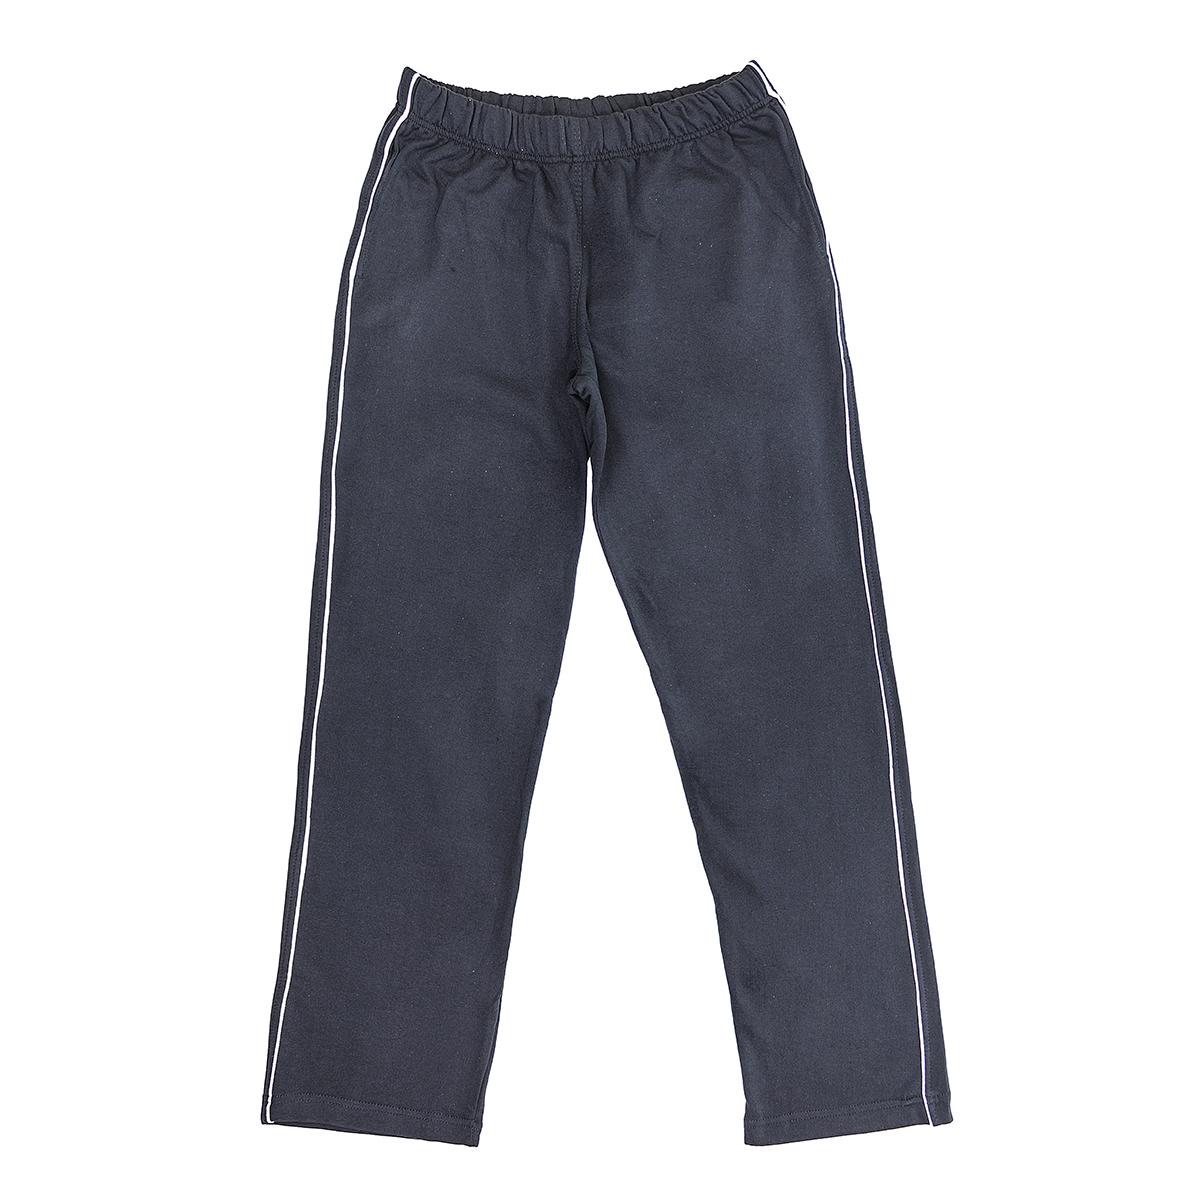 "Мужские брюки ""Родни"", размер 56 Узбекистан ""Textil Plus"""